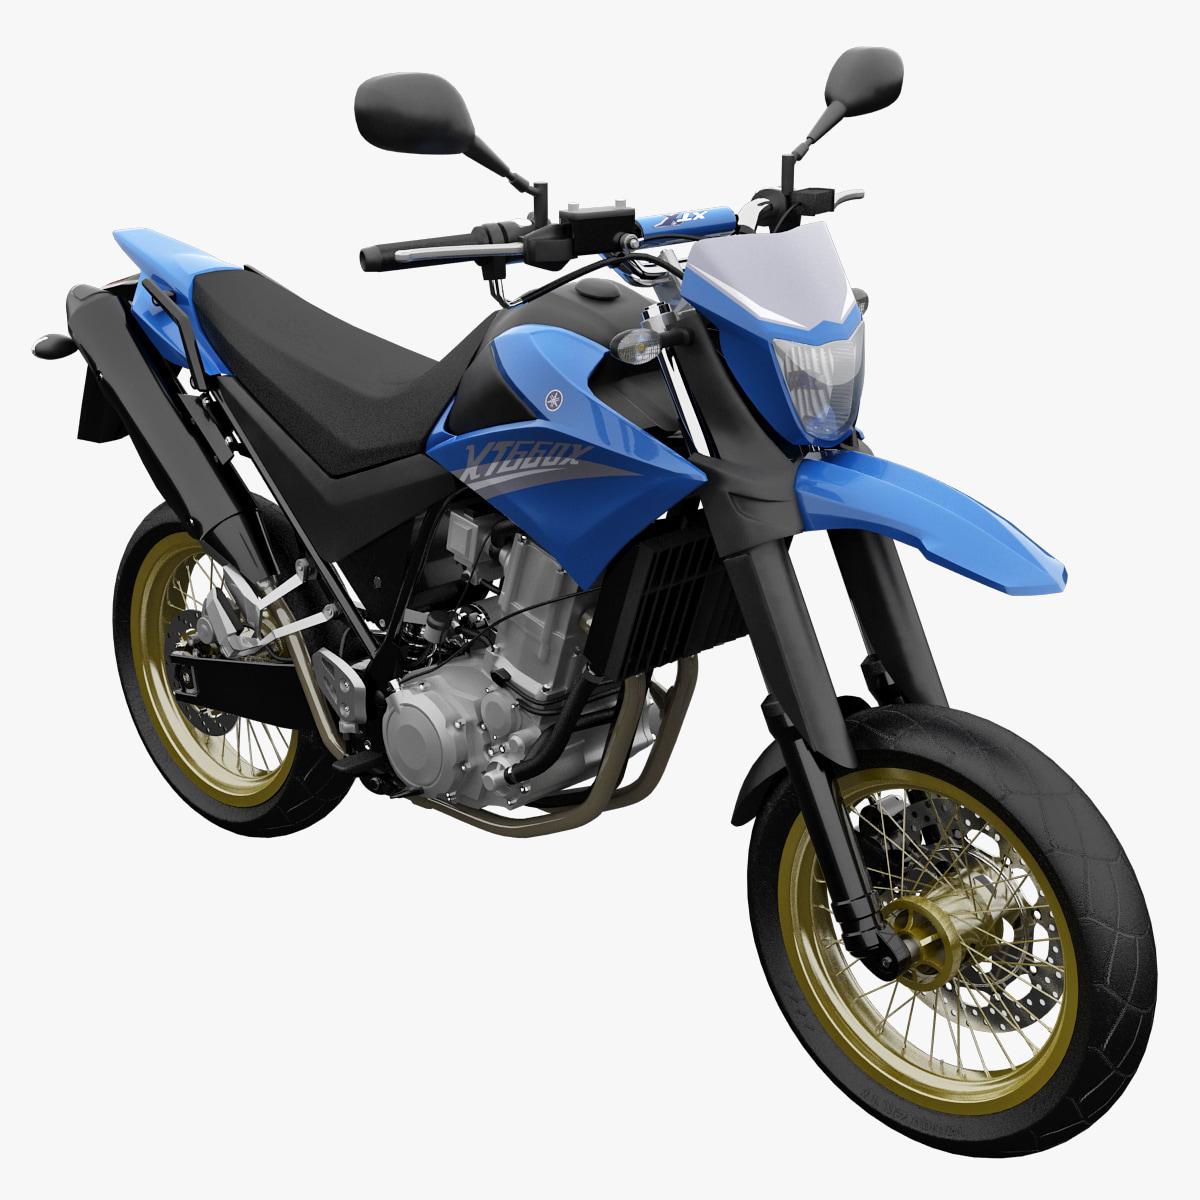 Yamaha_XT_660_X_max_0002.jpg